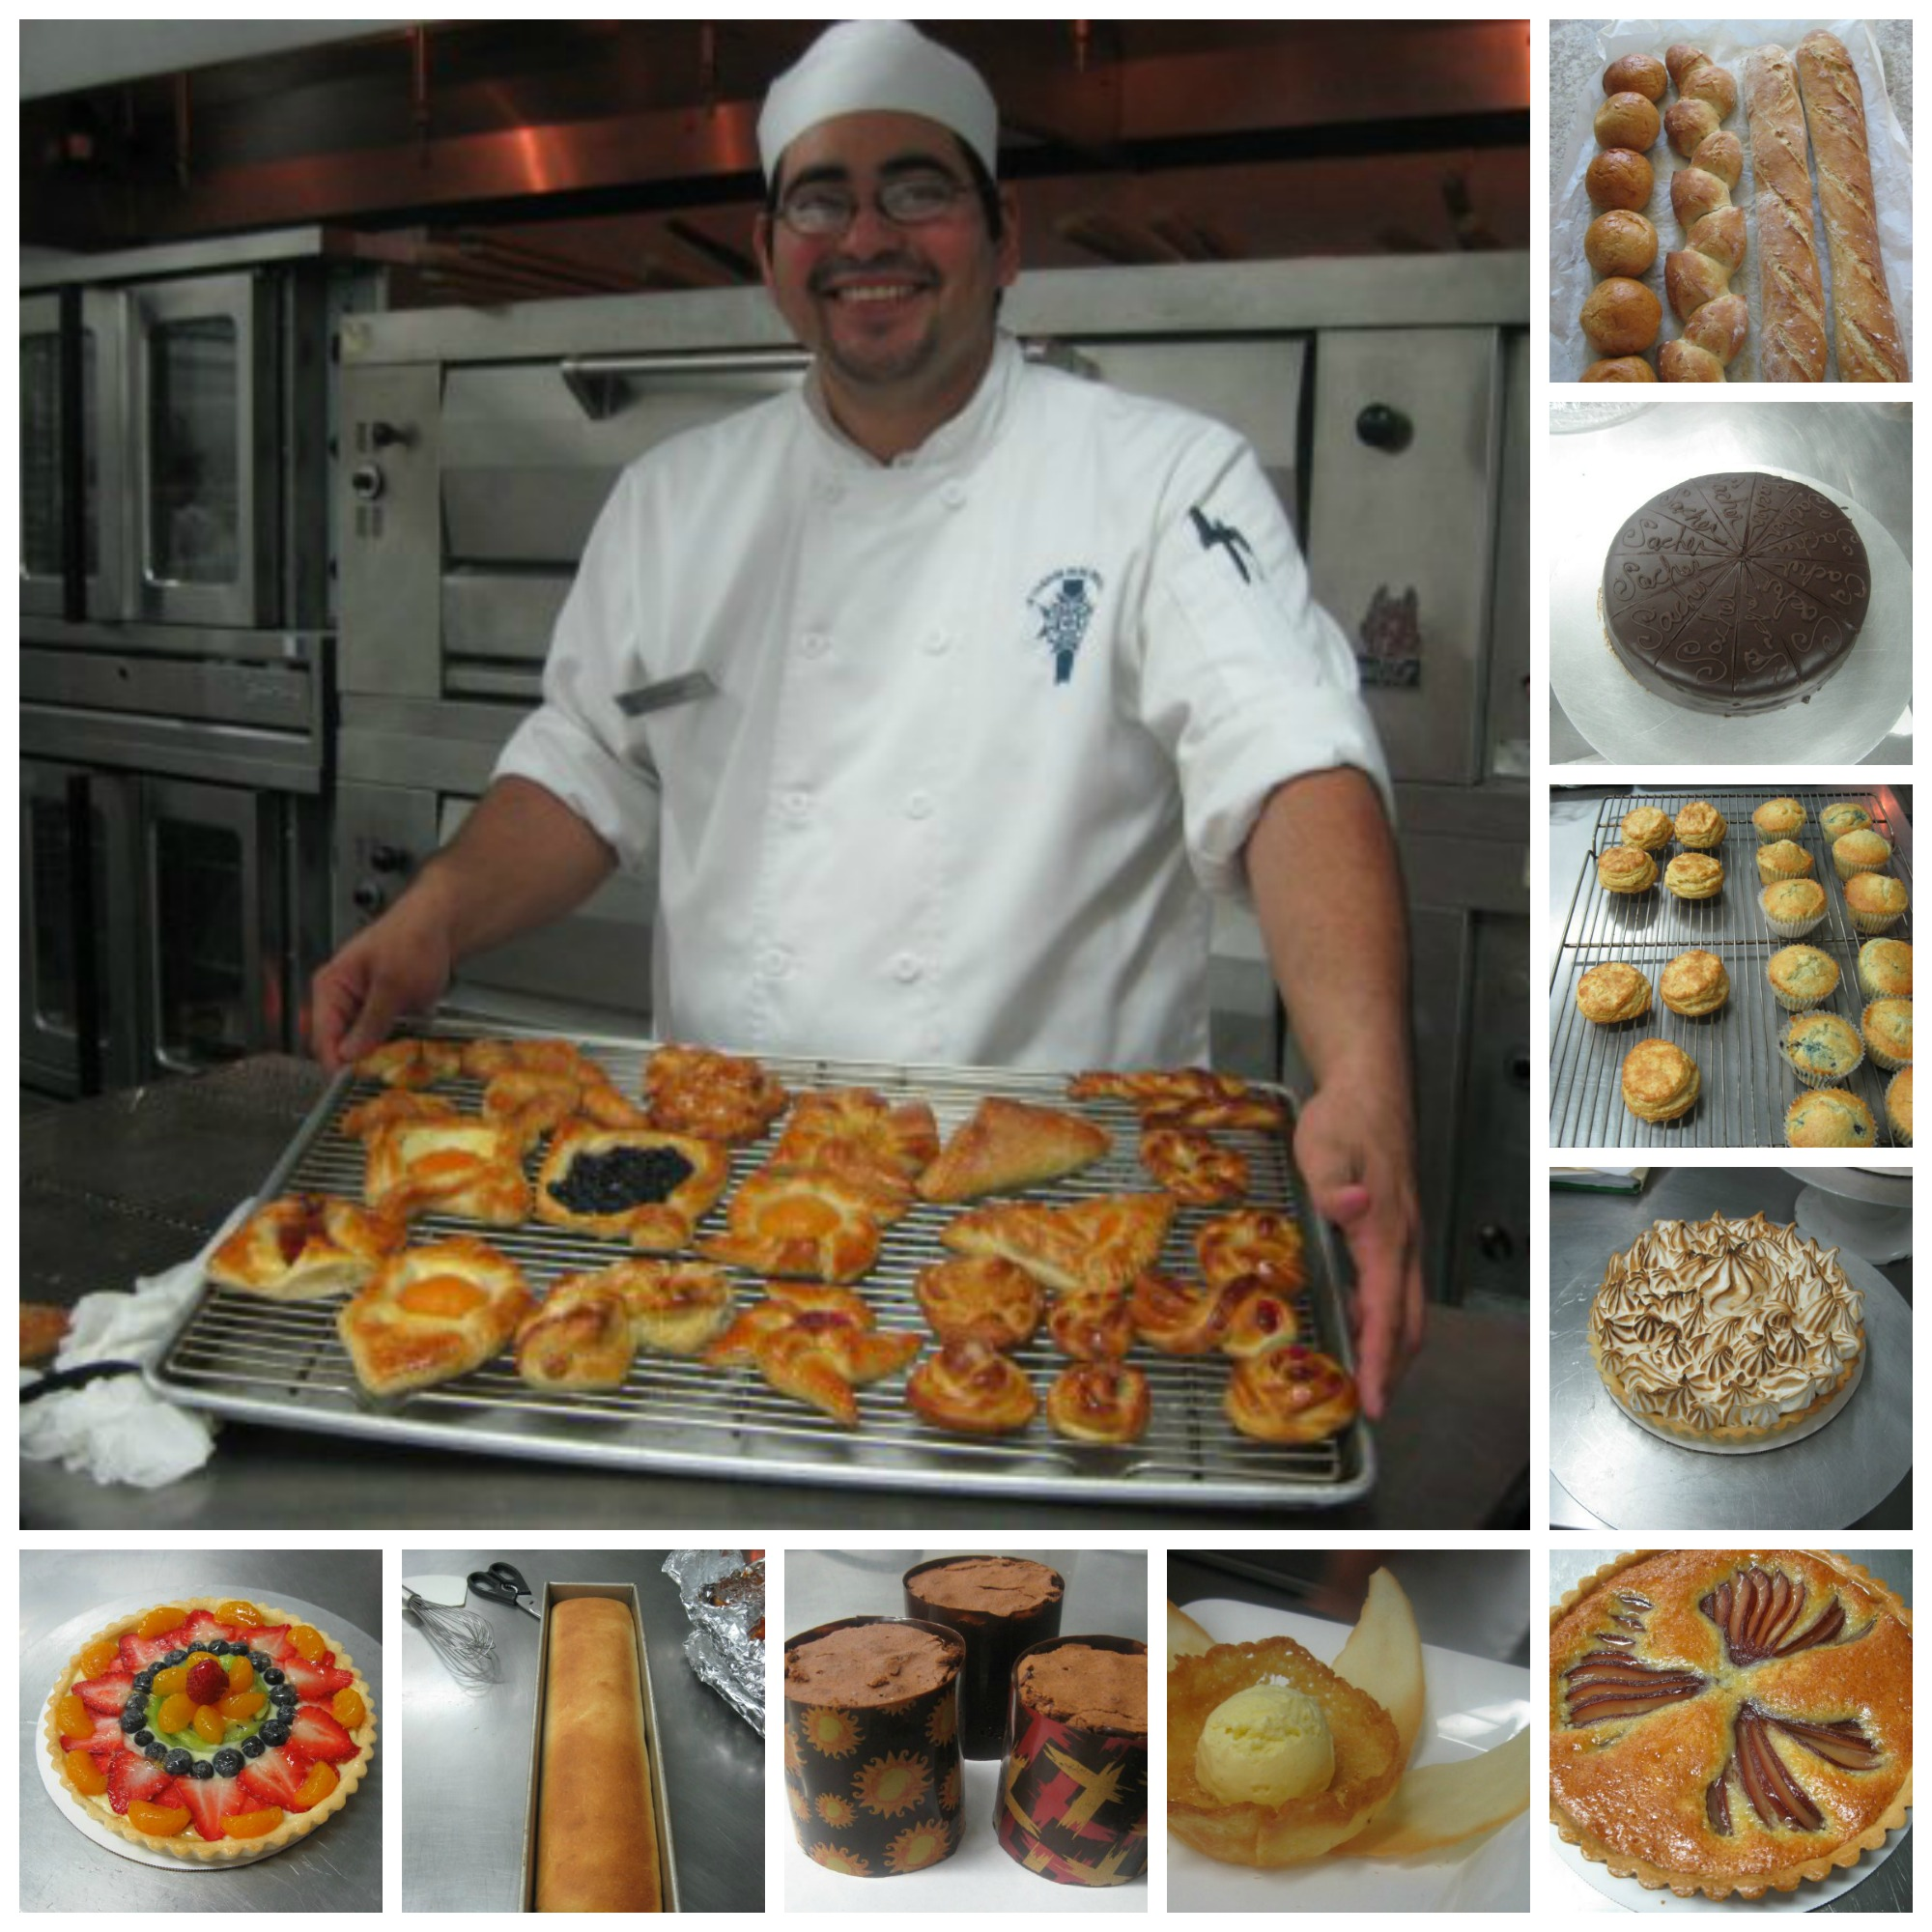 Baker Art Rodriguez